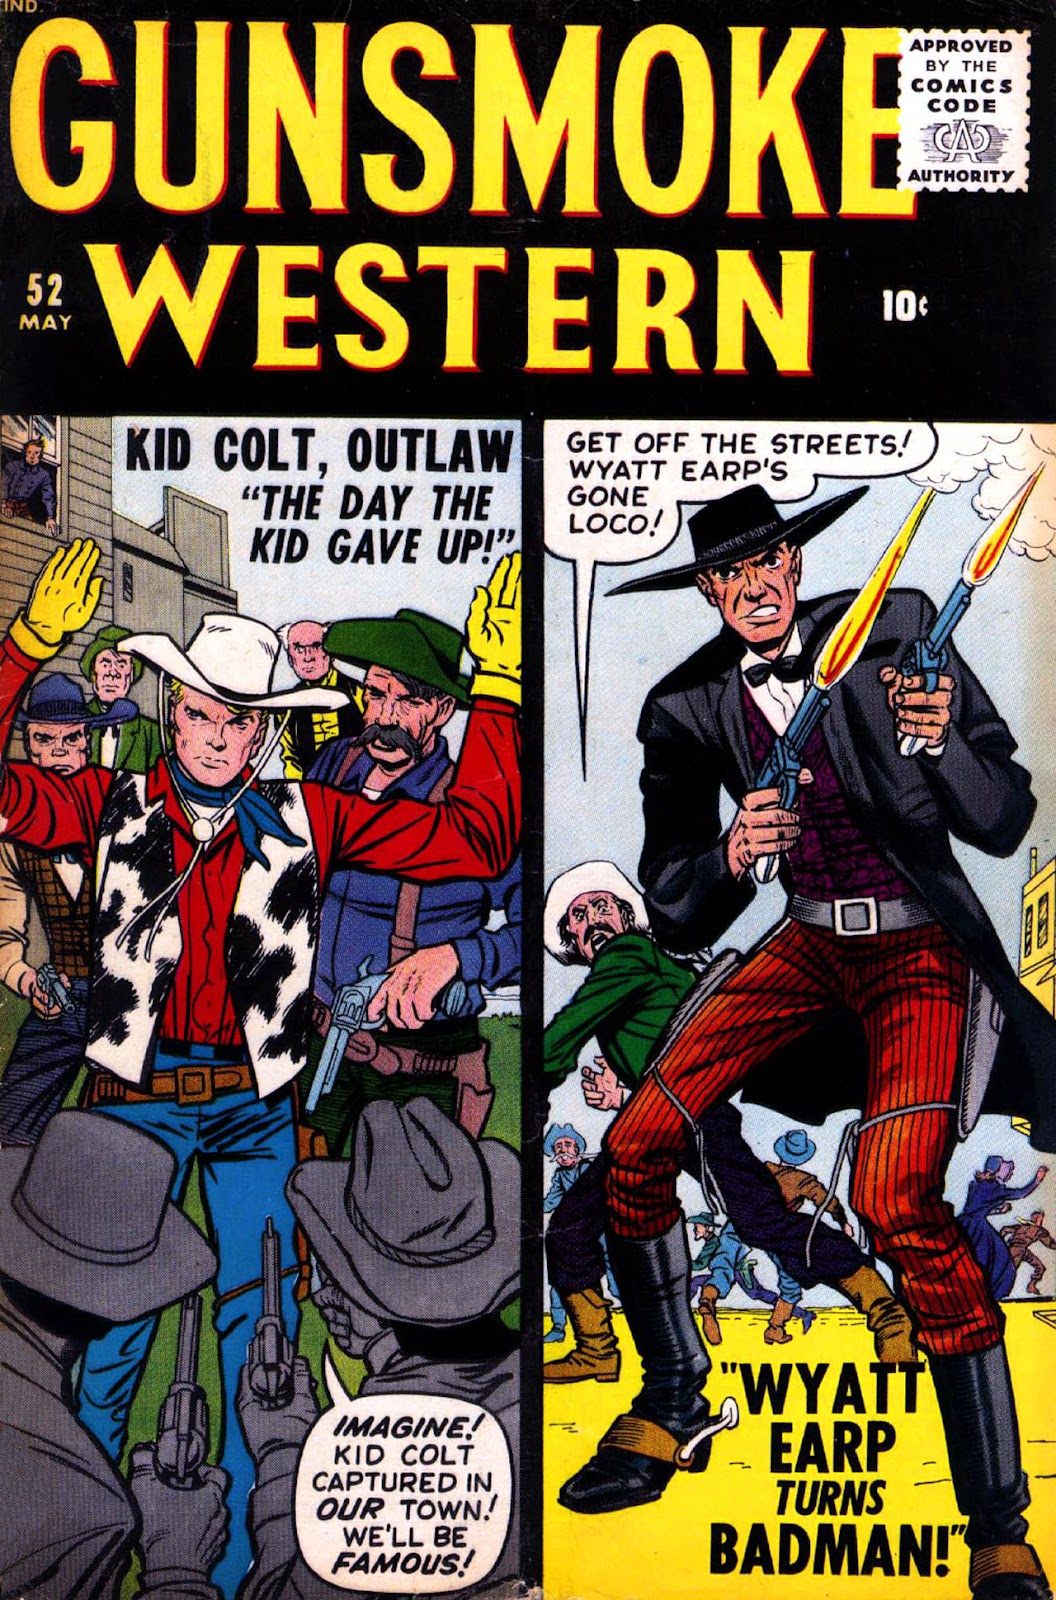 Gunsmoke Western issue 52 - Page 1